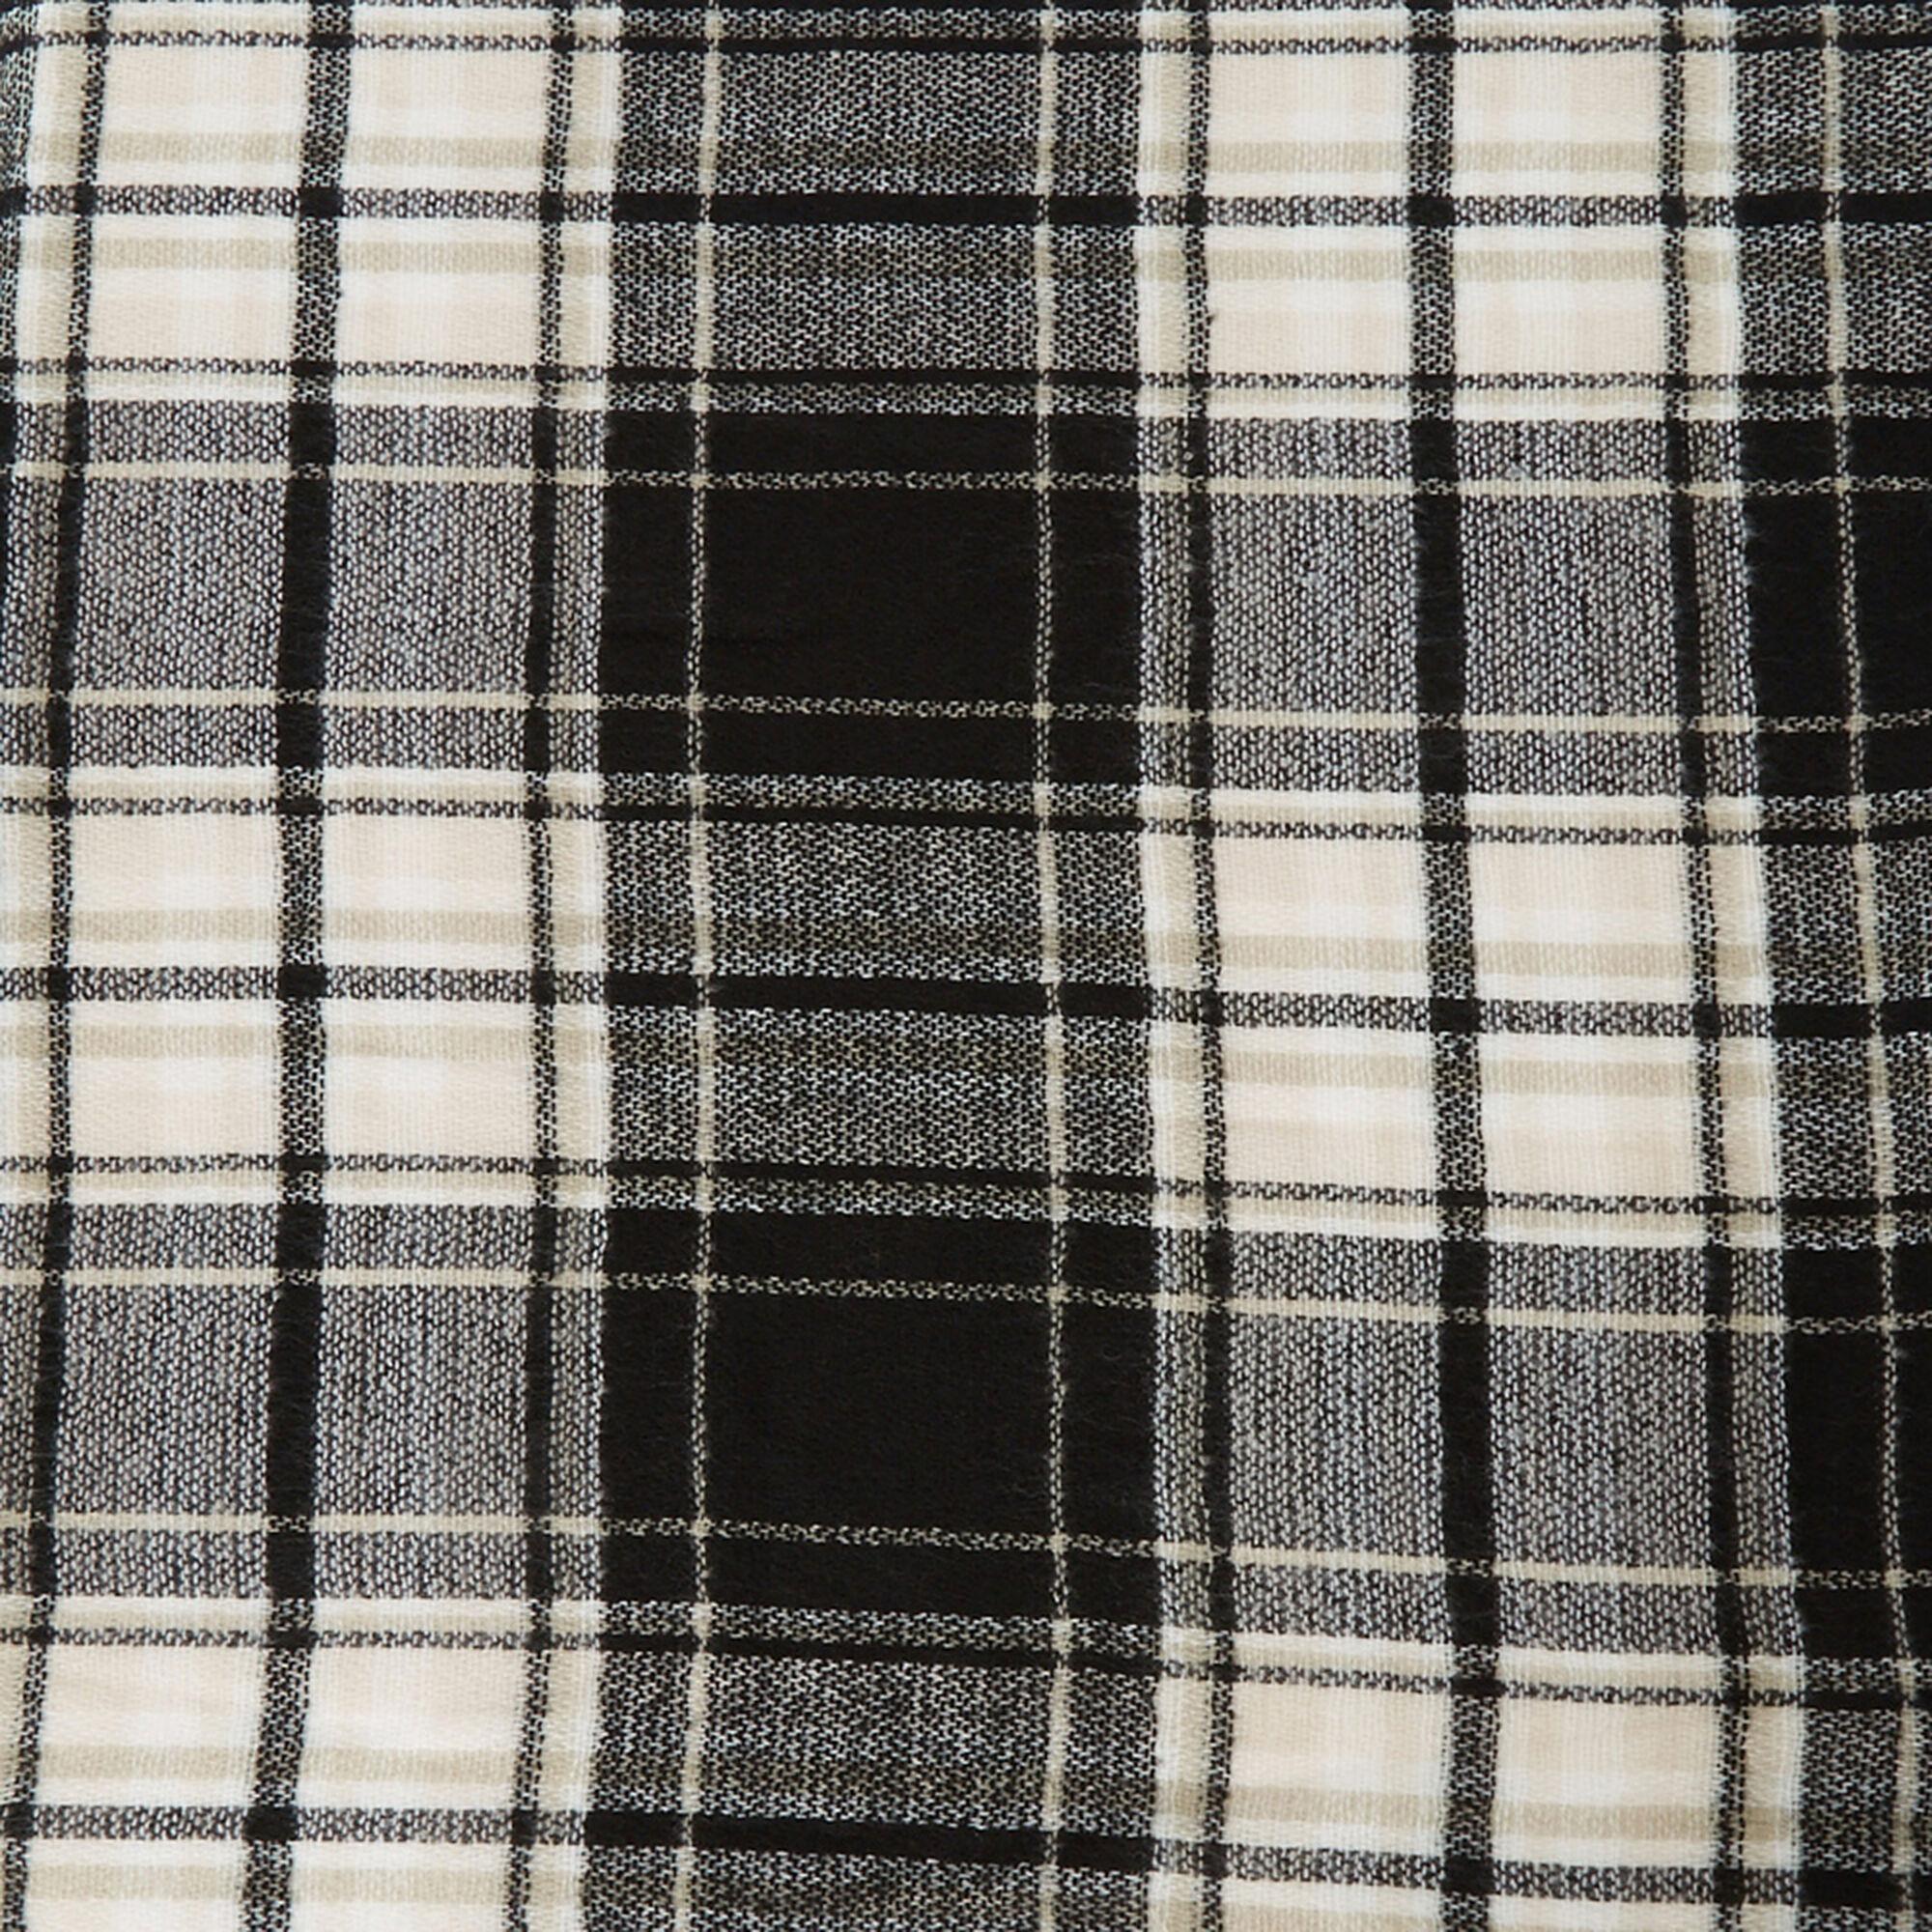 Black And White Plaid Blanket.Black And White Plaid Blanket Scarf